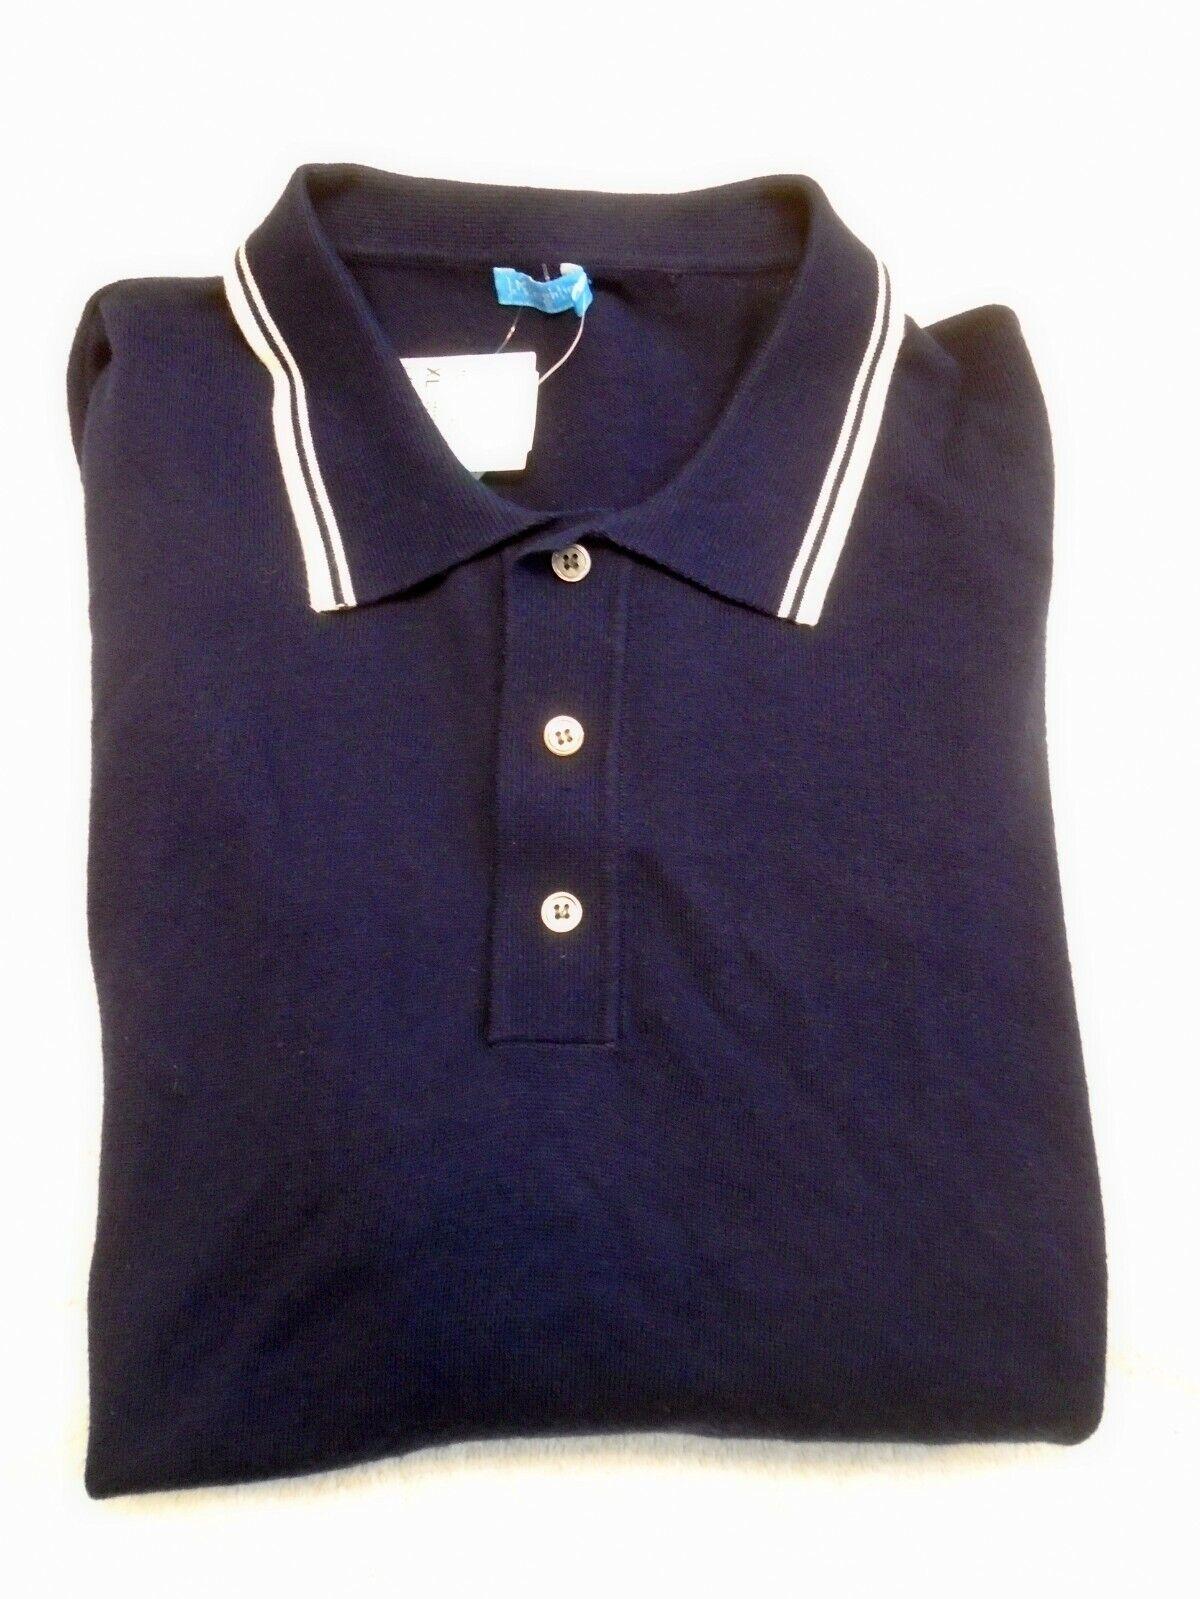 J McLaughlin Cotton Blend Knit Long Sleeve Polo Shirt NWT XL  Navy bluee